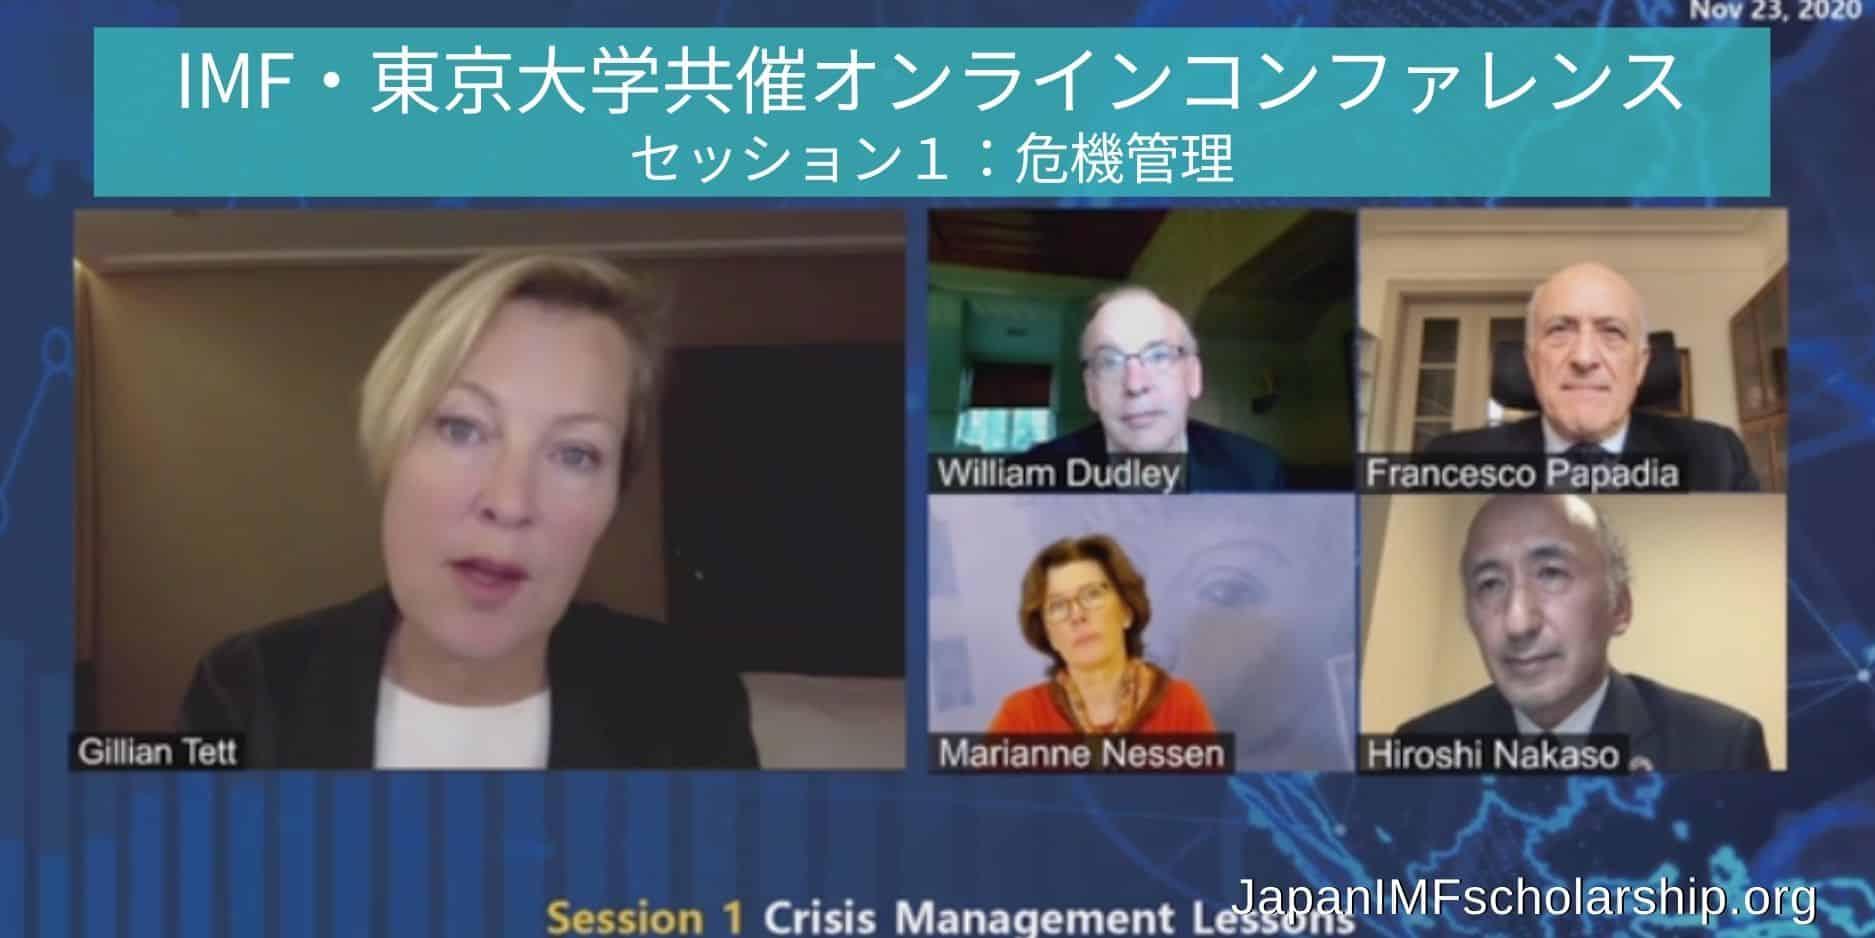 jisp web-fb imf-the university of tokyo virtual conference session 1